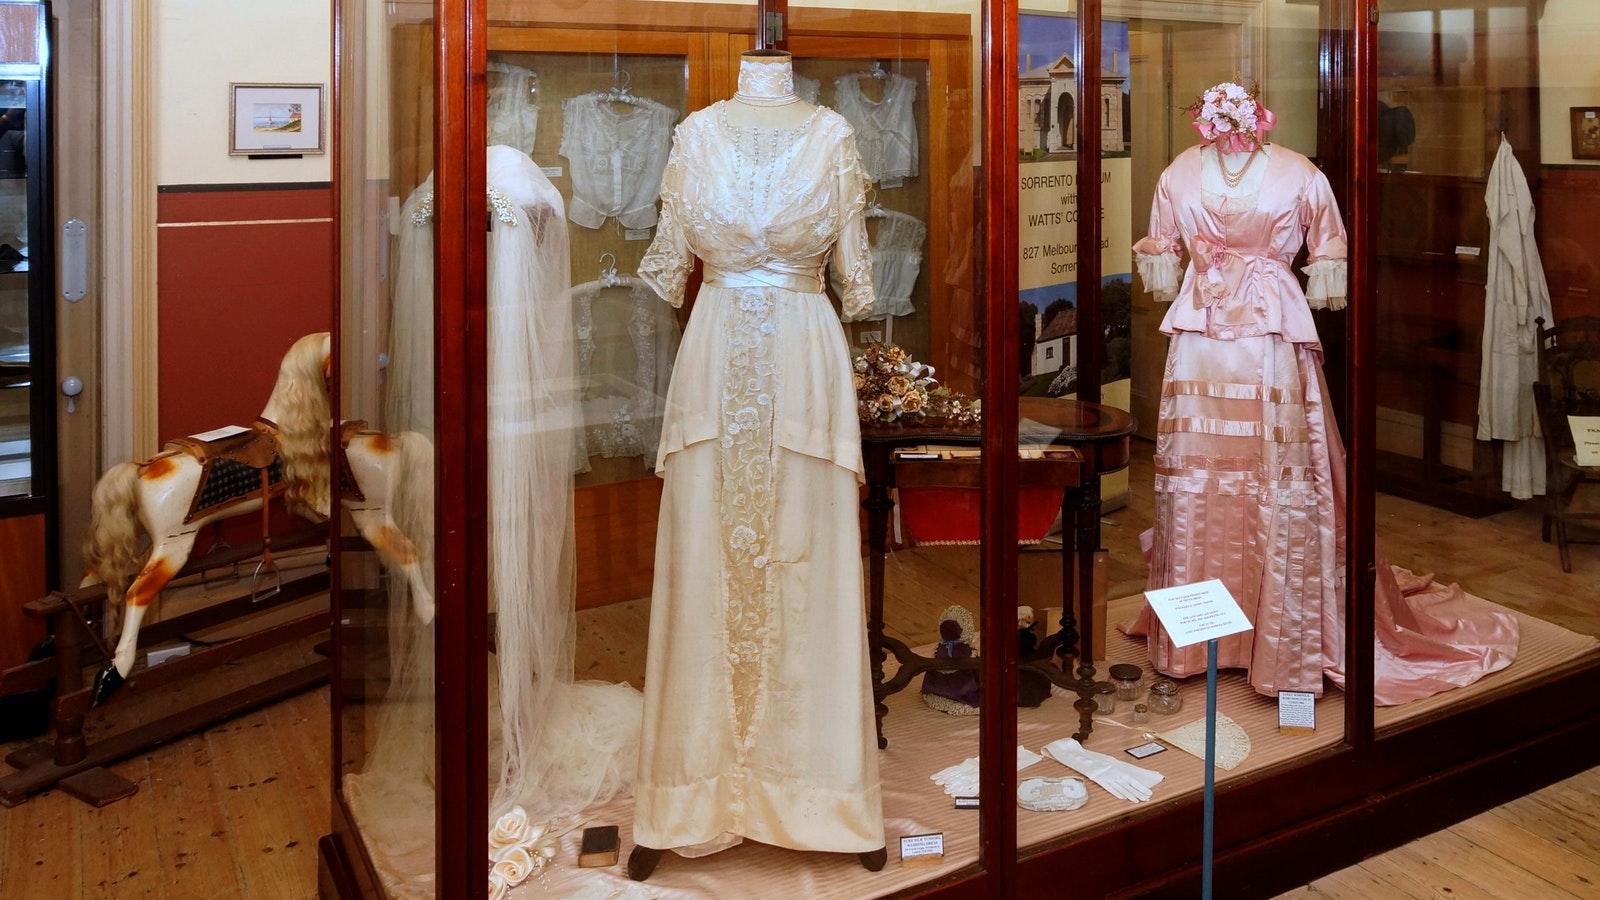 Beautiful old ladies' long dresses, including a cream wedding dress and black taffeta day dress